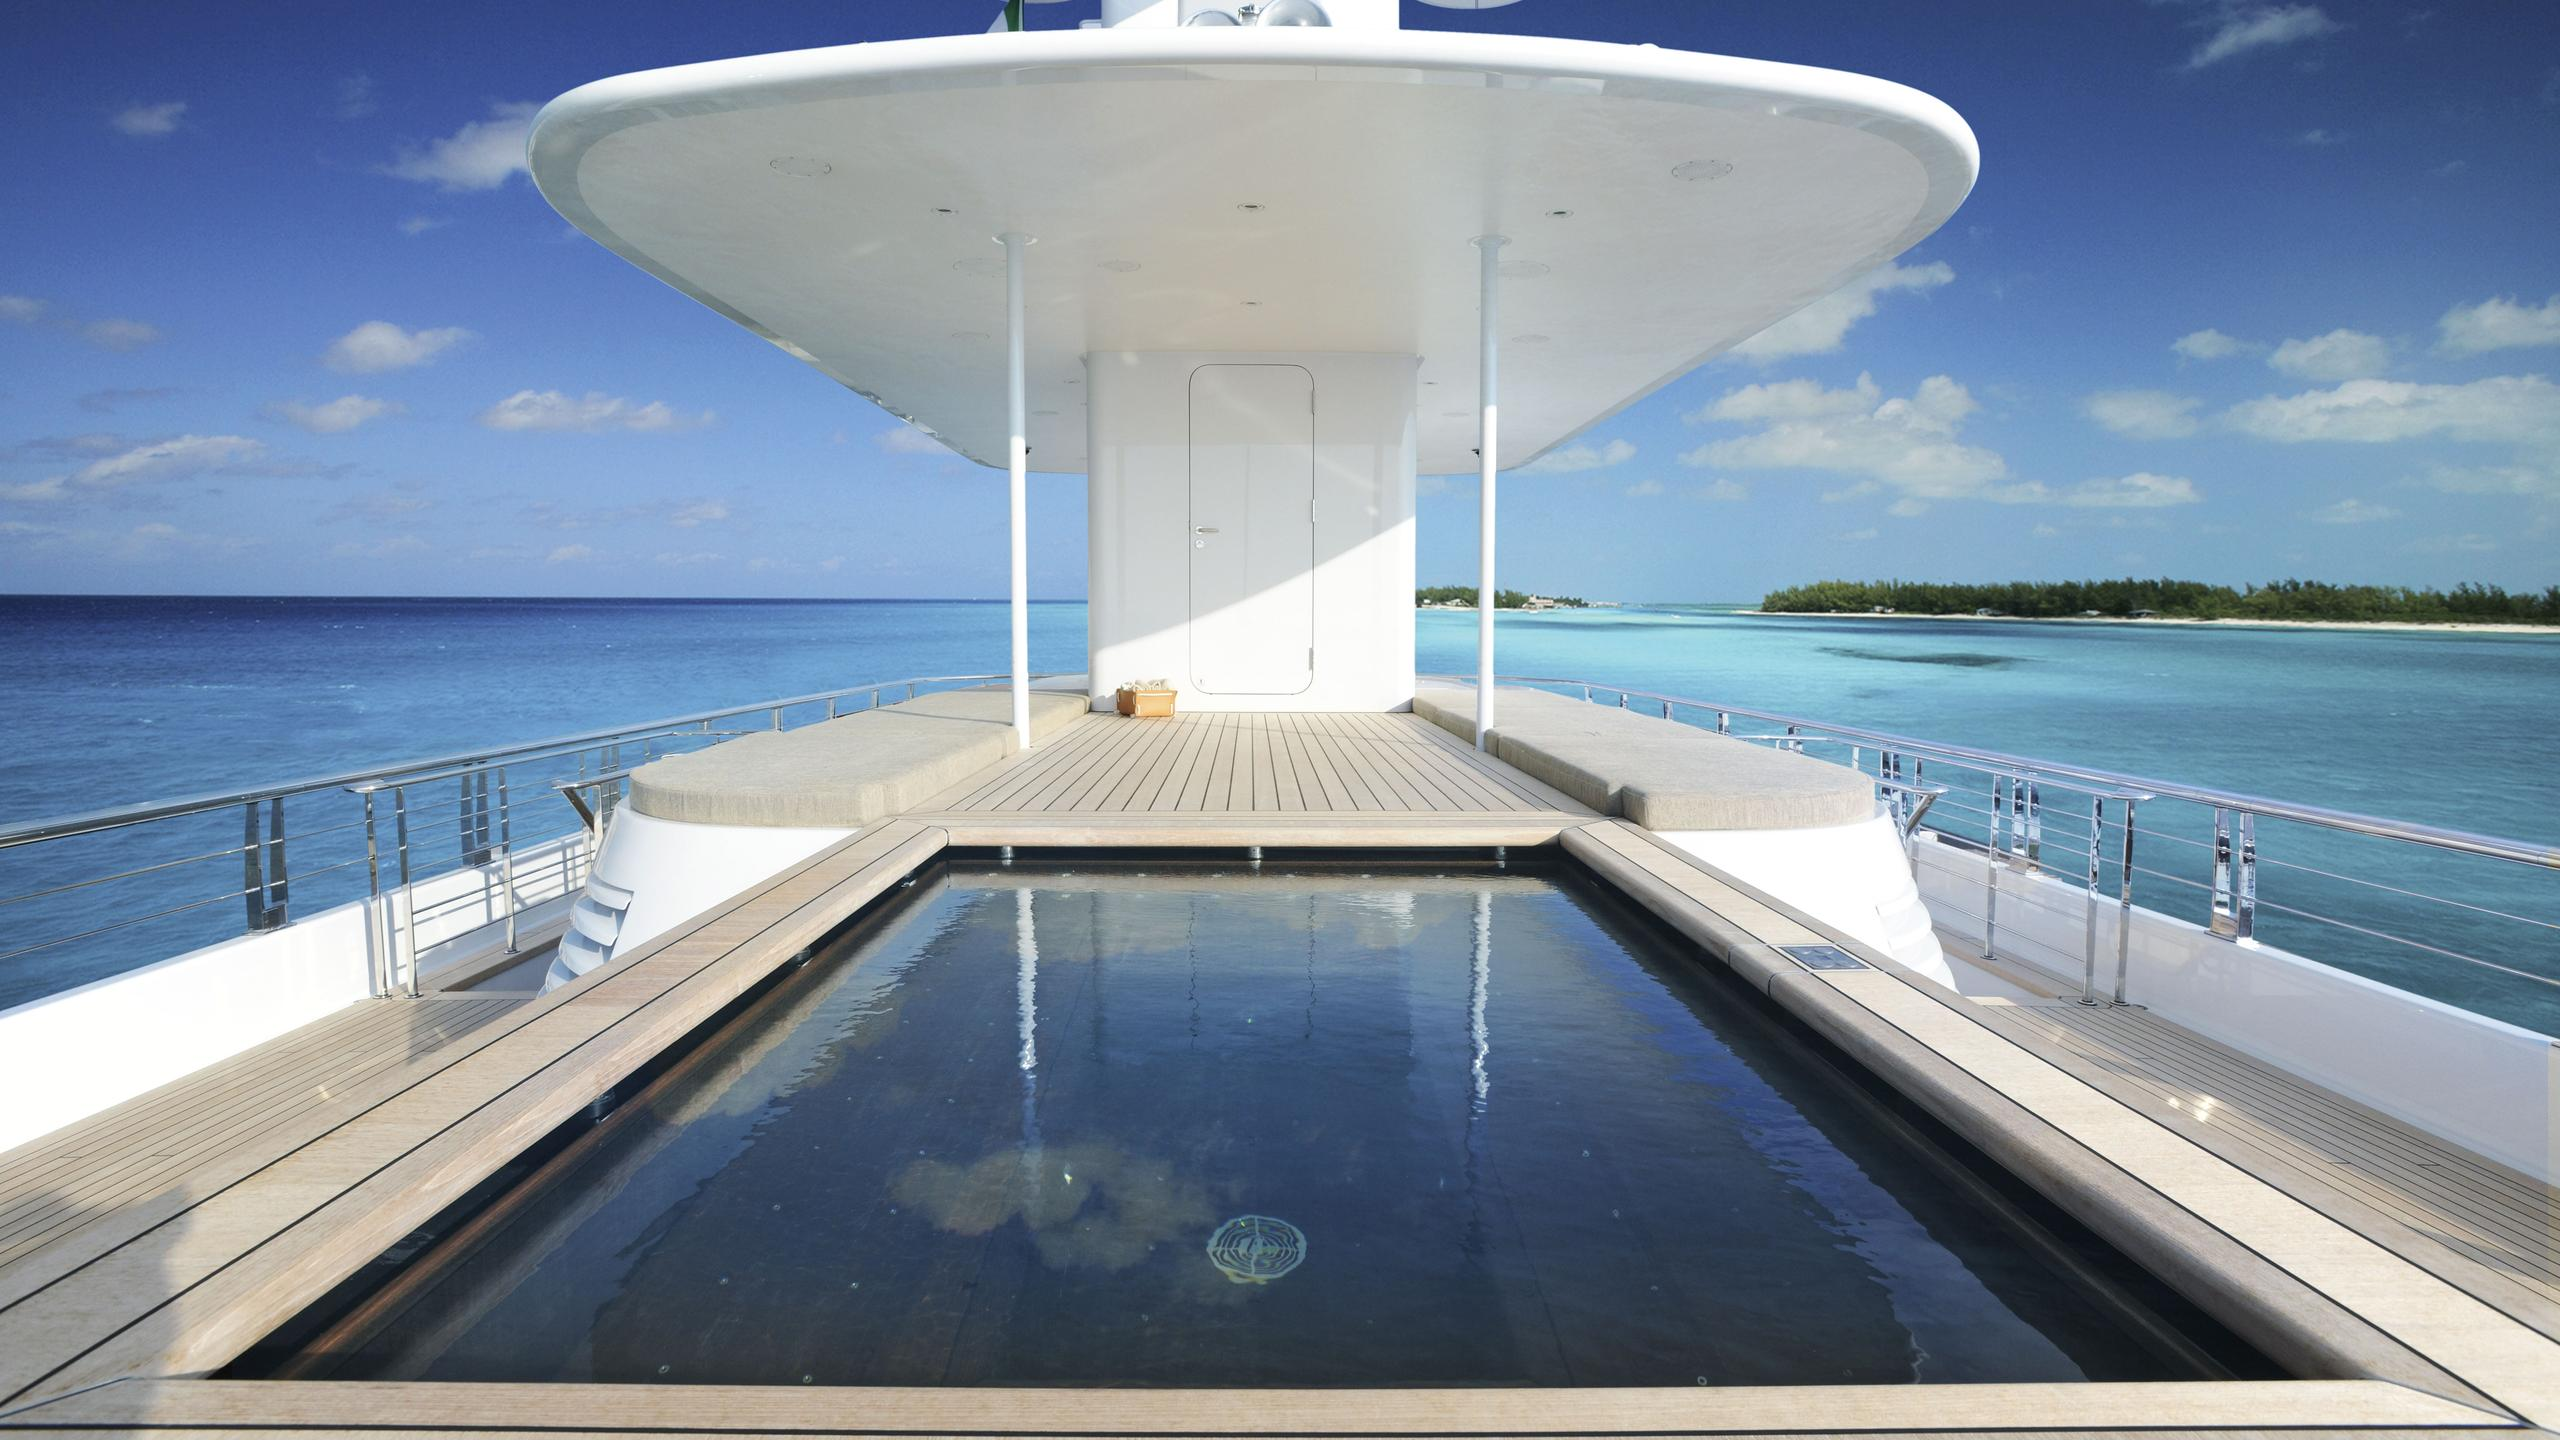 musashi-motor-yacht-feadhsip-2011-88m-pool